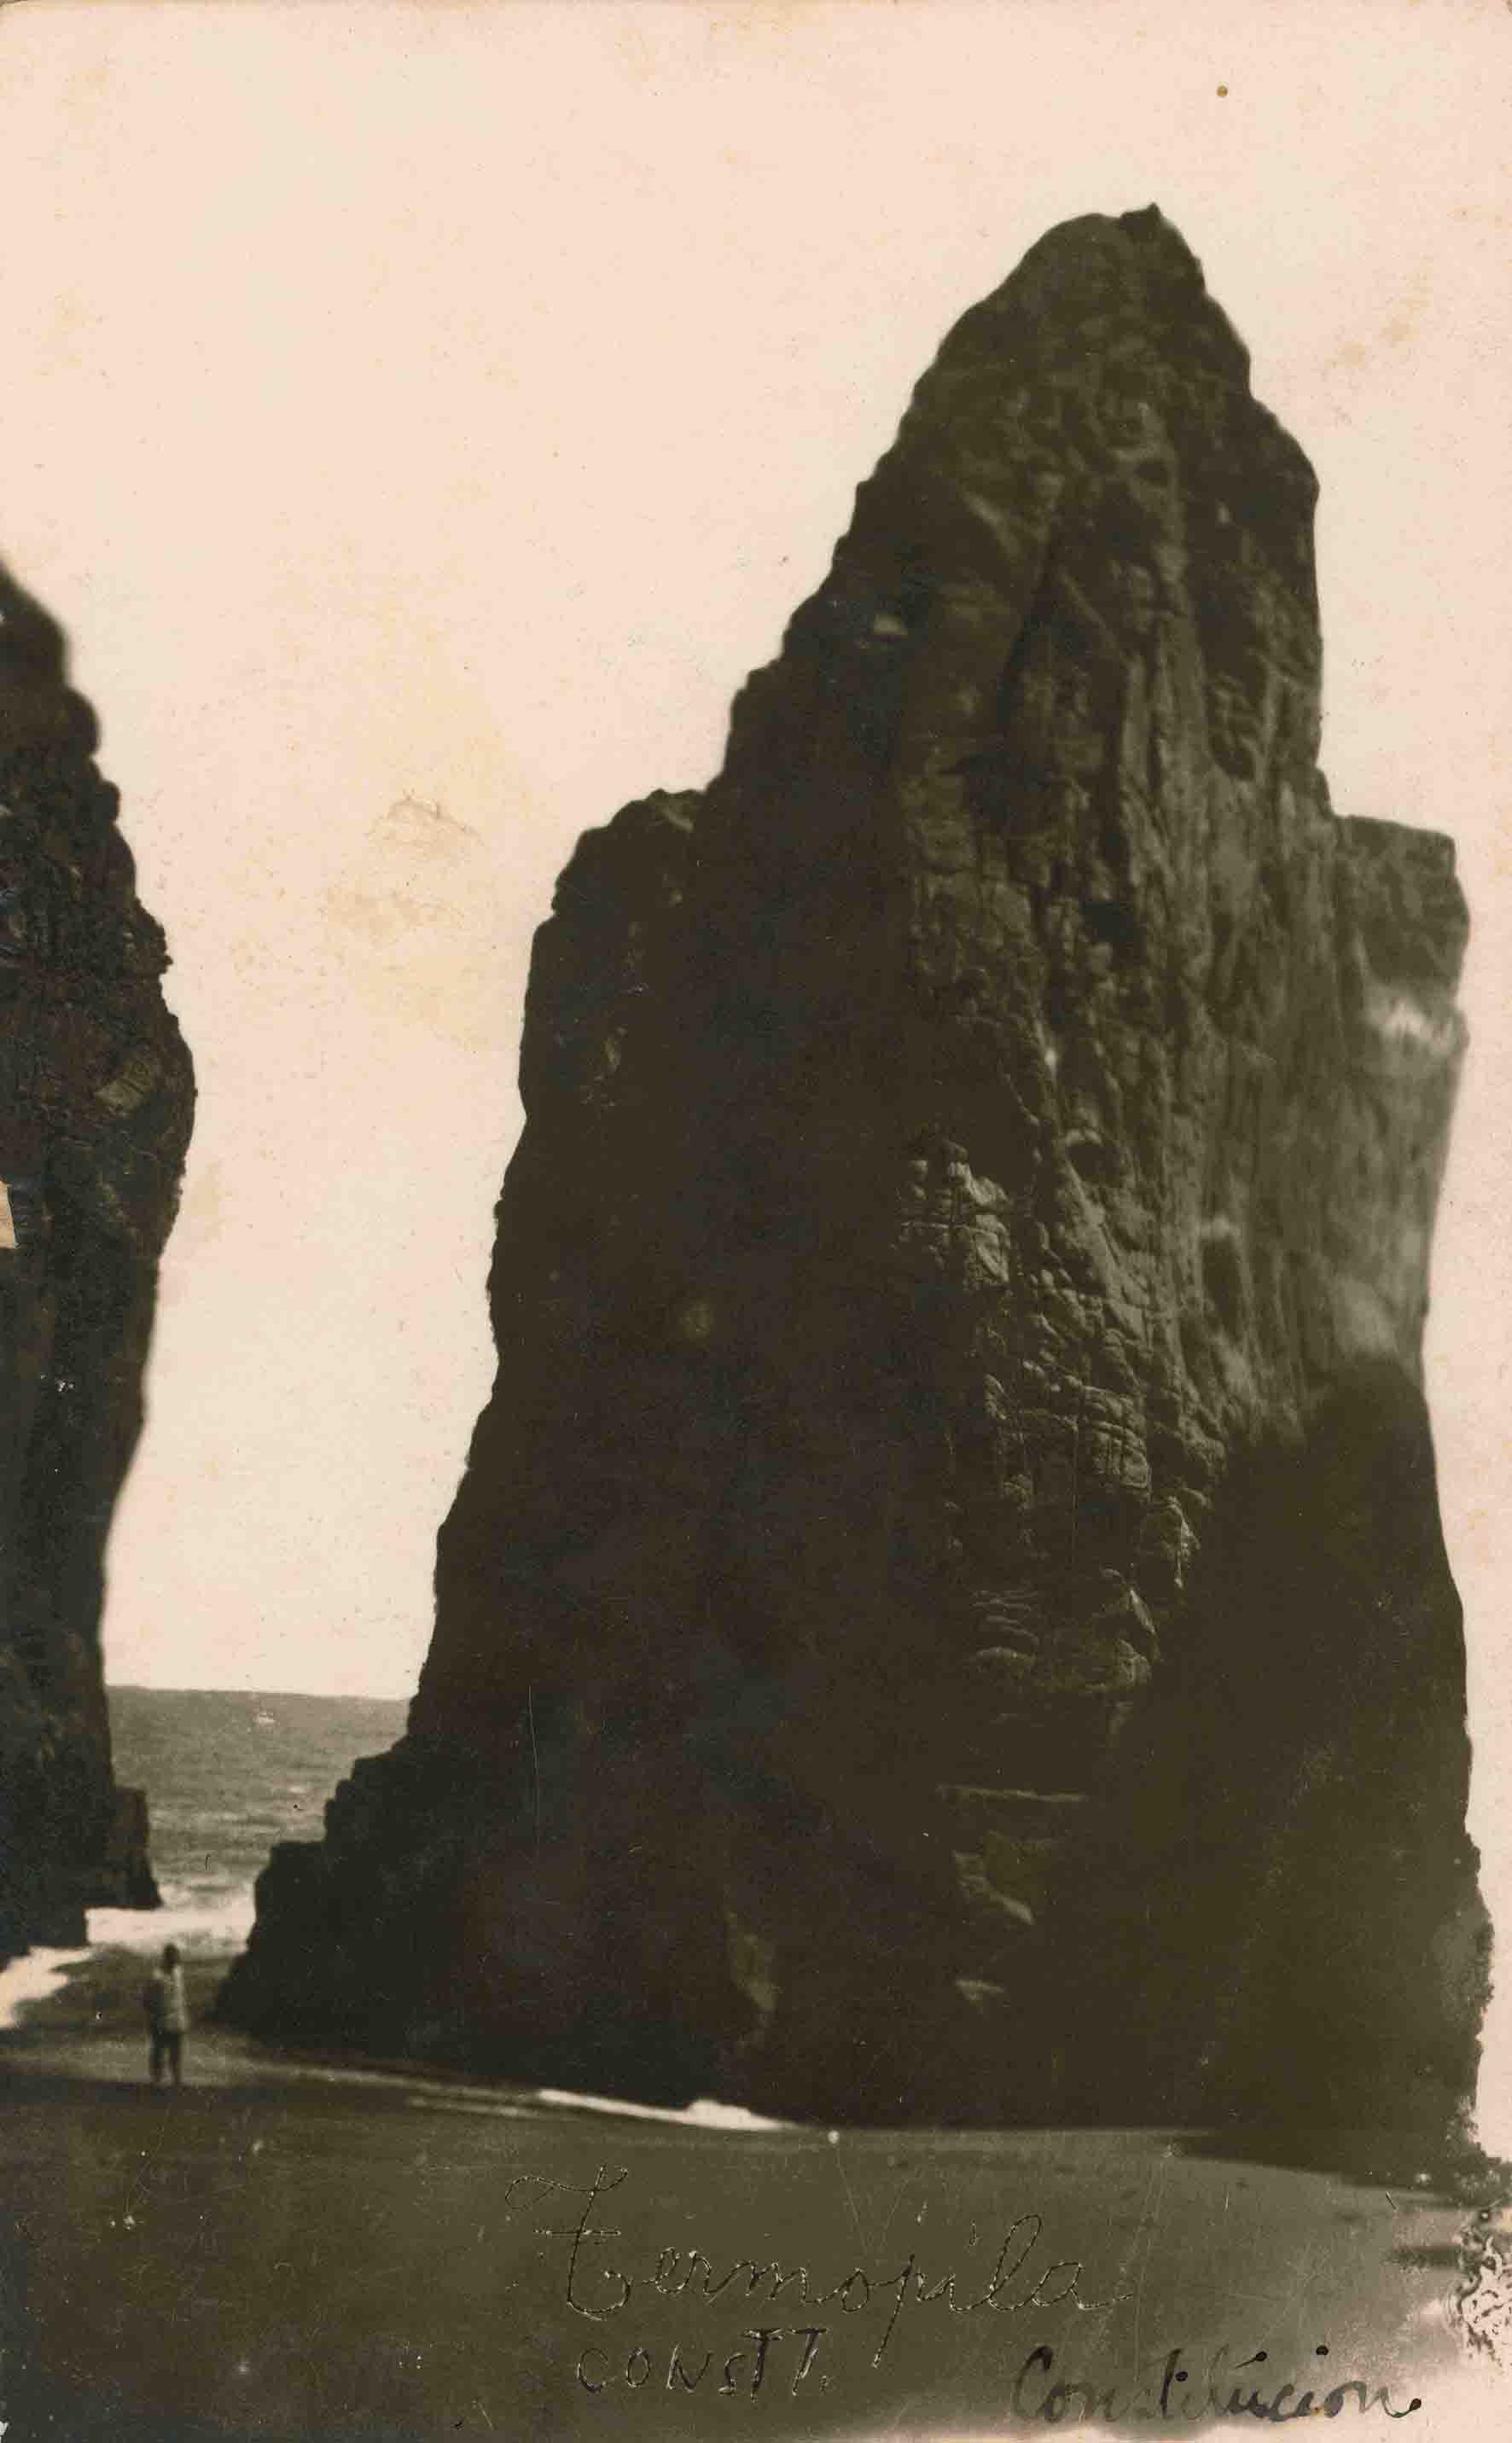 Enterreno - Fotos históricas de chile - fotos antiguas de Chile - Rocas de Constituciín ca. 1915